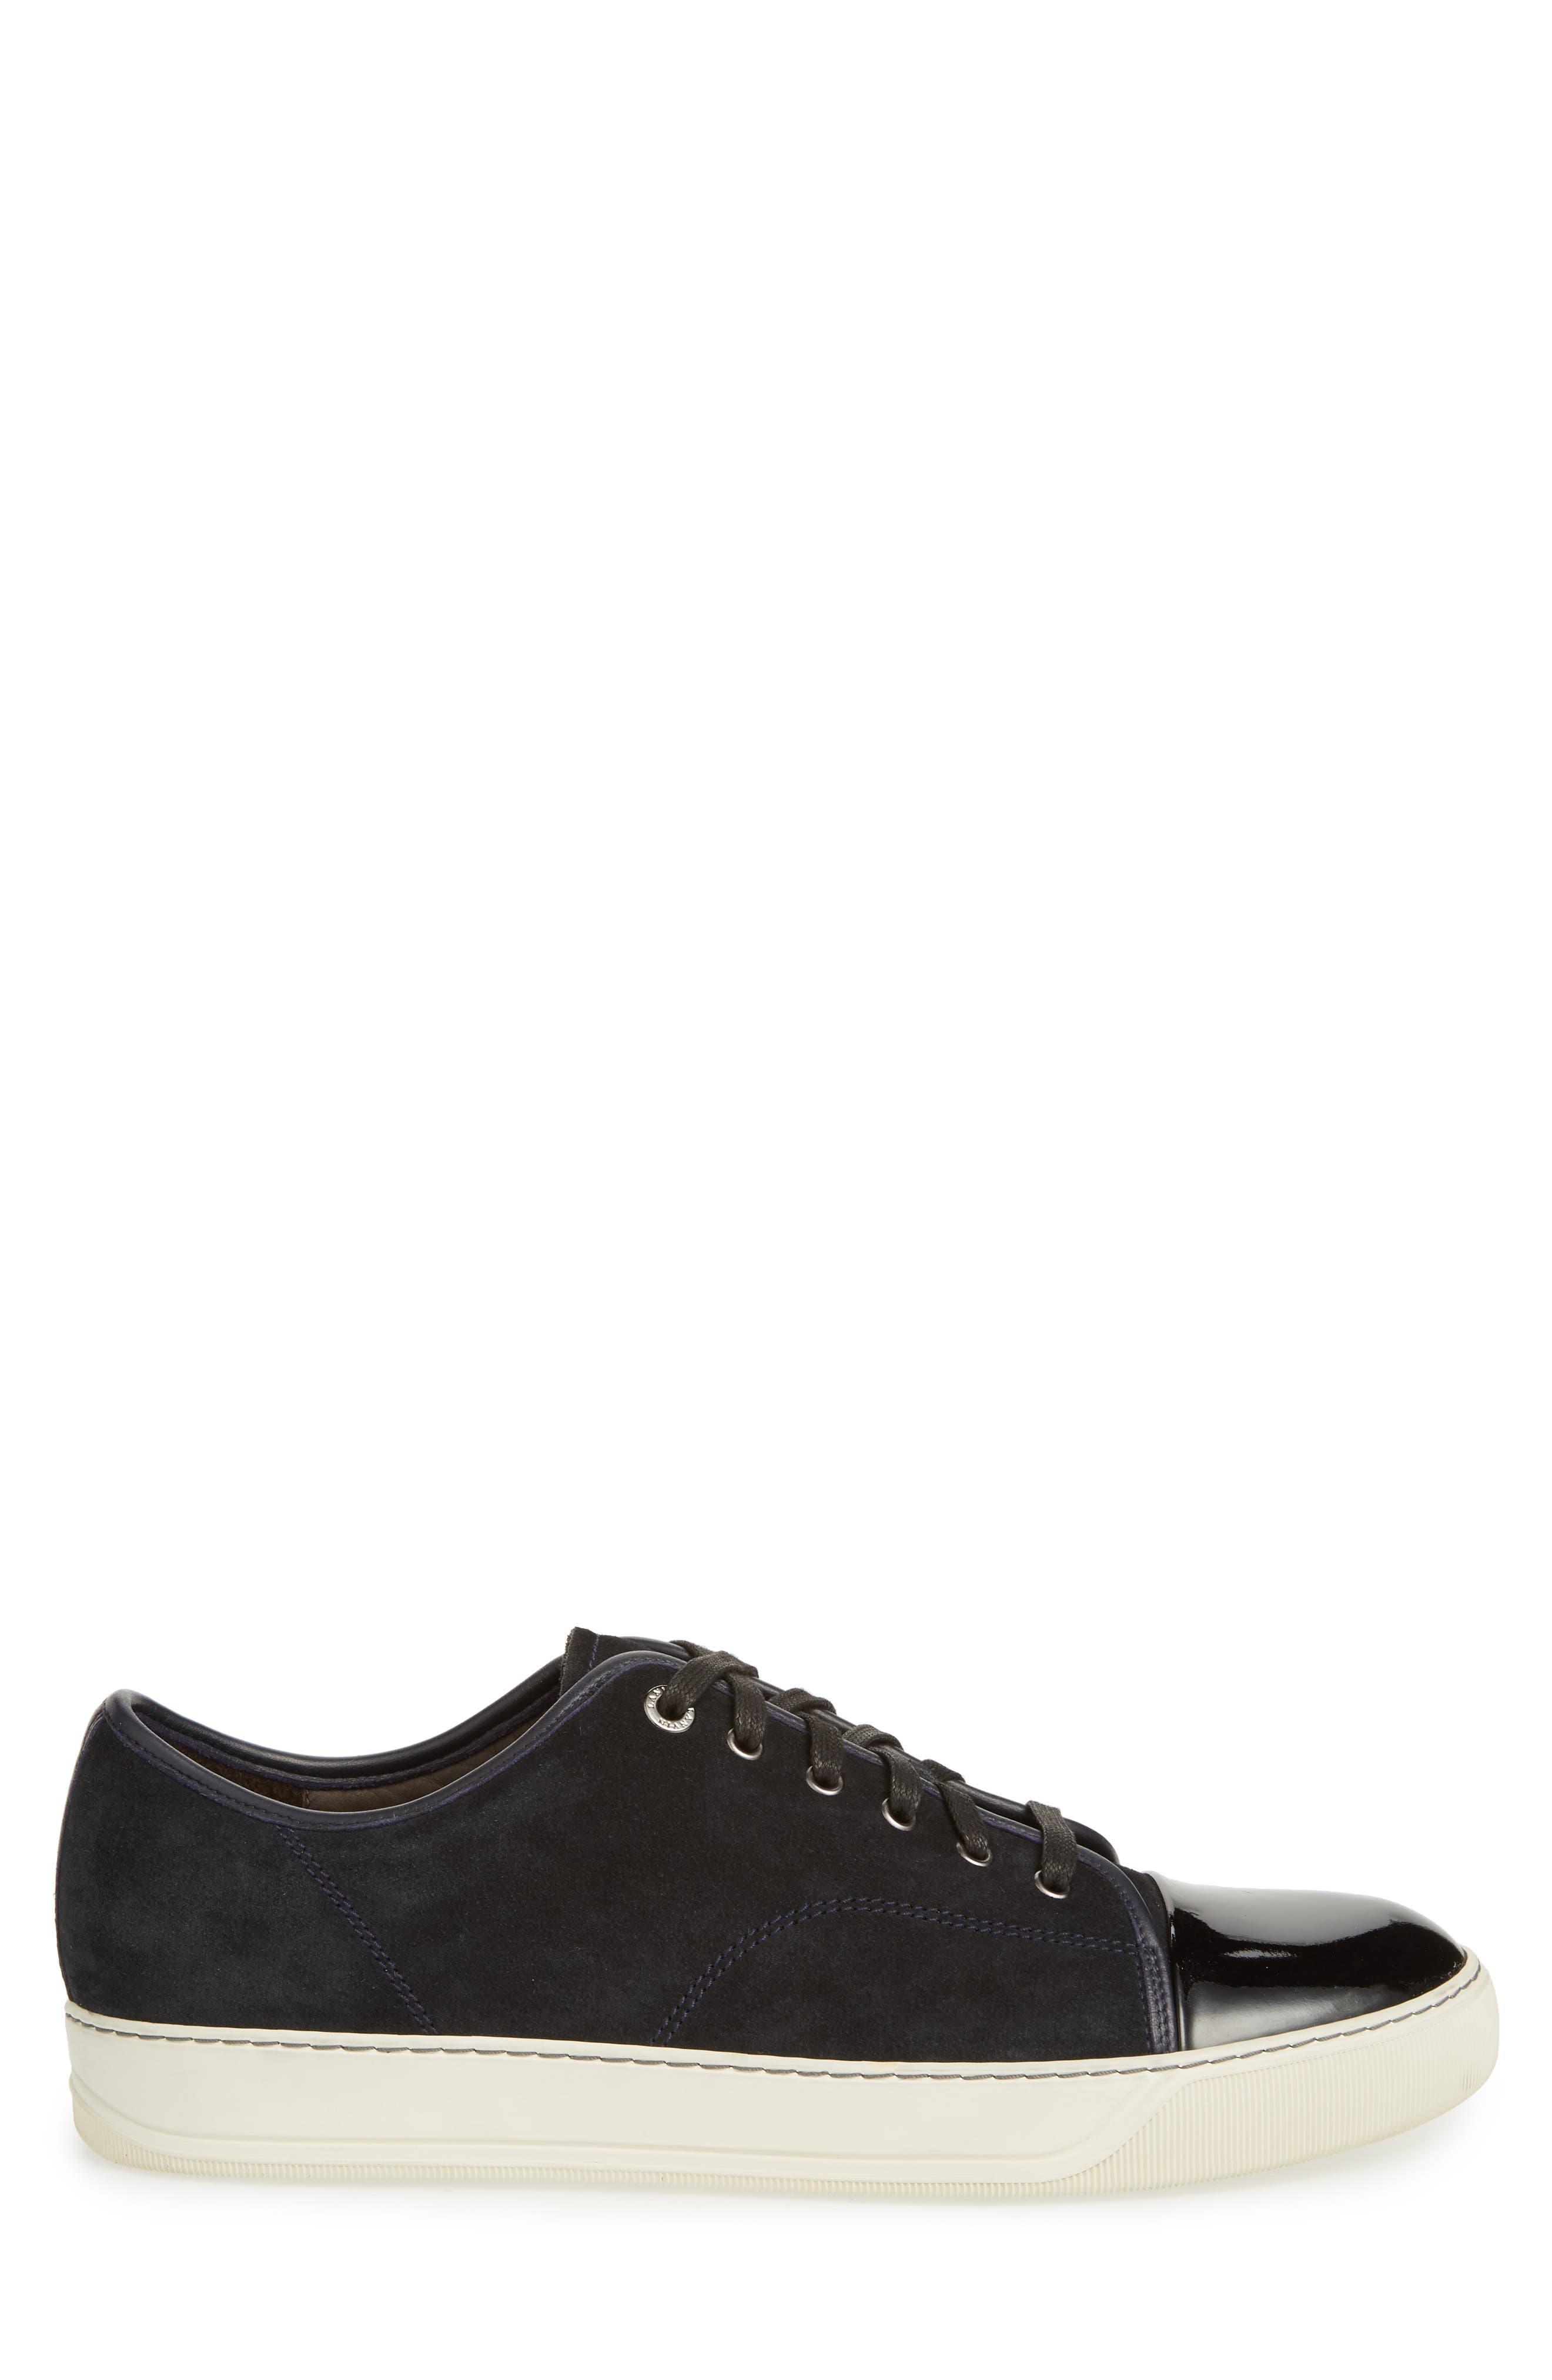 Low Top Suede Sneaker,                             Alternate thumbnail 3, color,                             024